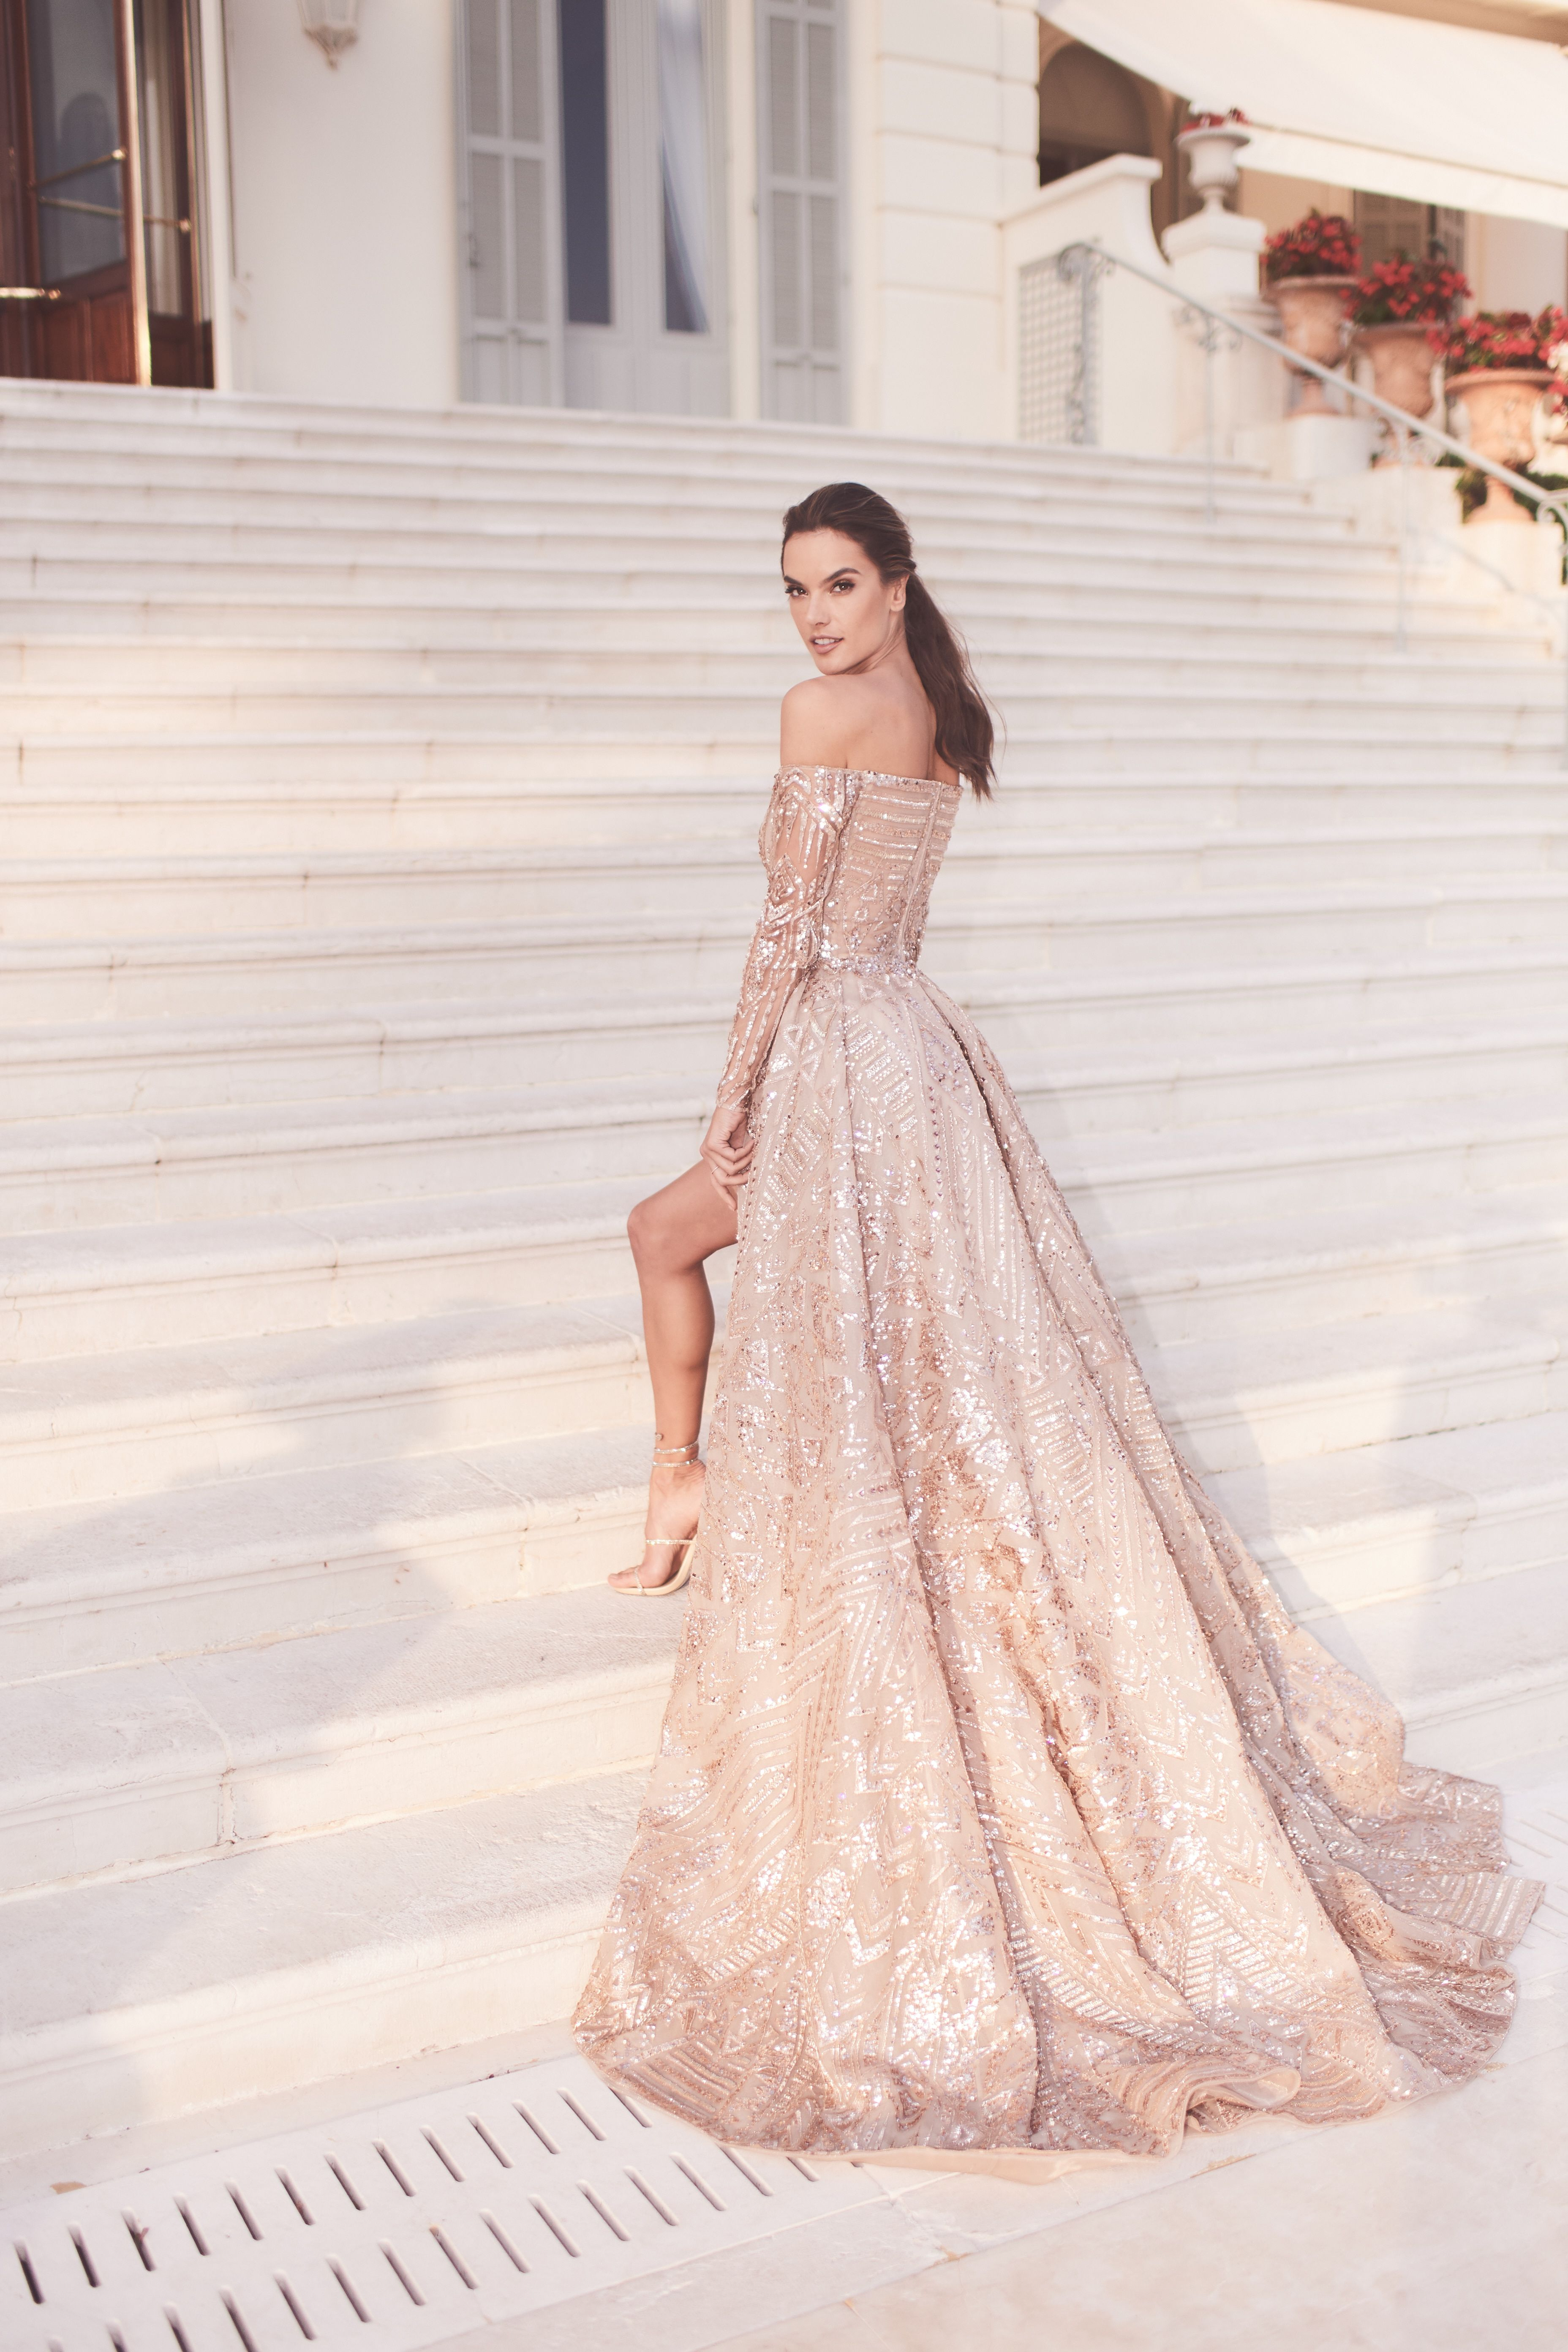 846ee487ad Alessandra Ambrosio in Zuhair Murad at the 71st Cannes Film Festival 2018   alessandraambrosio  zuhairmurad